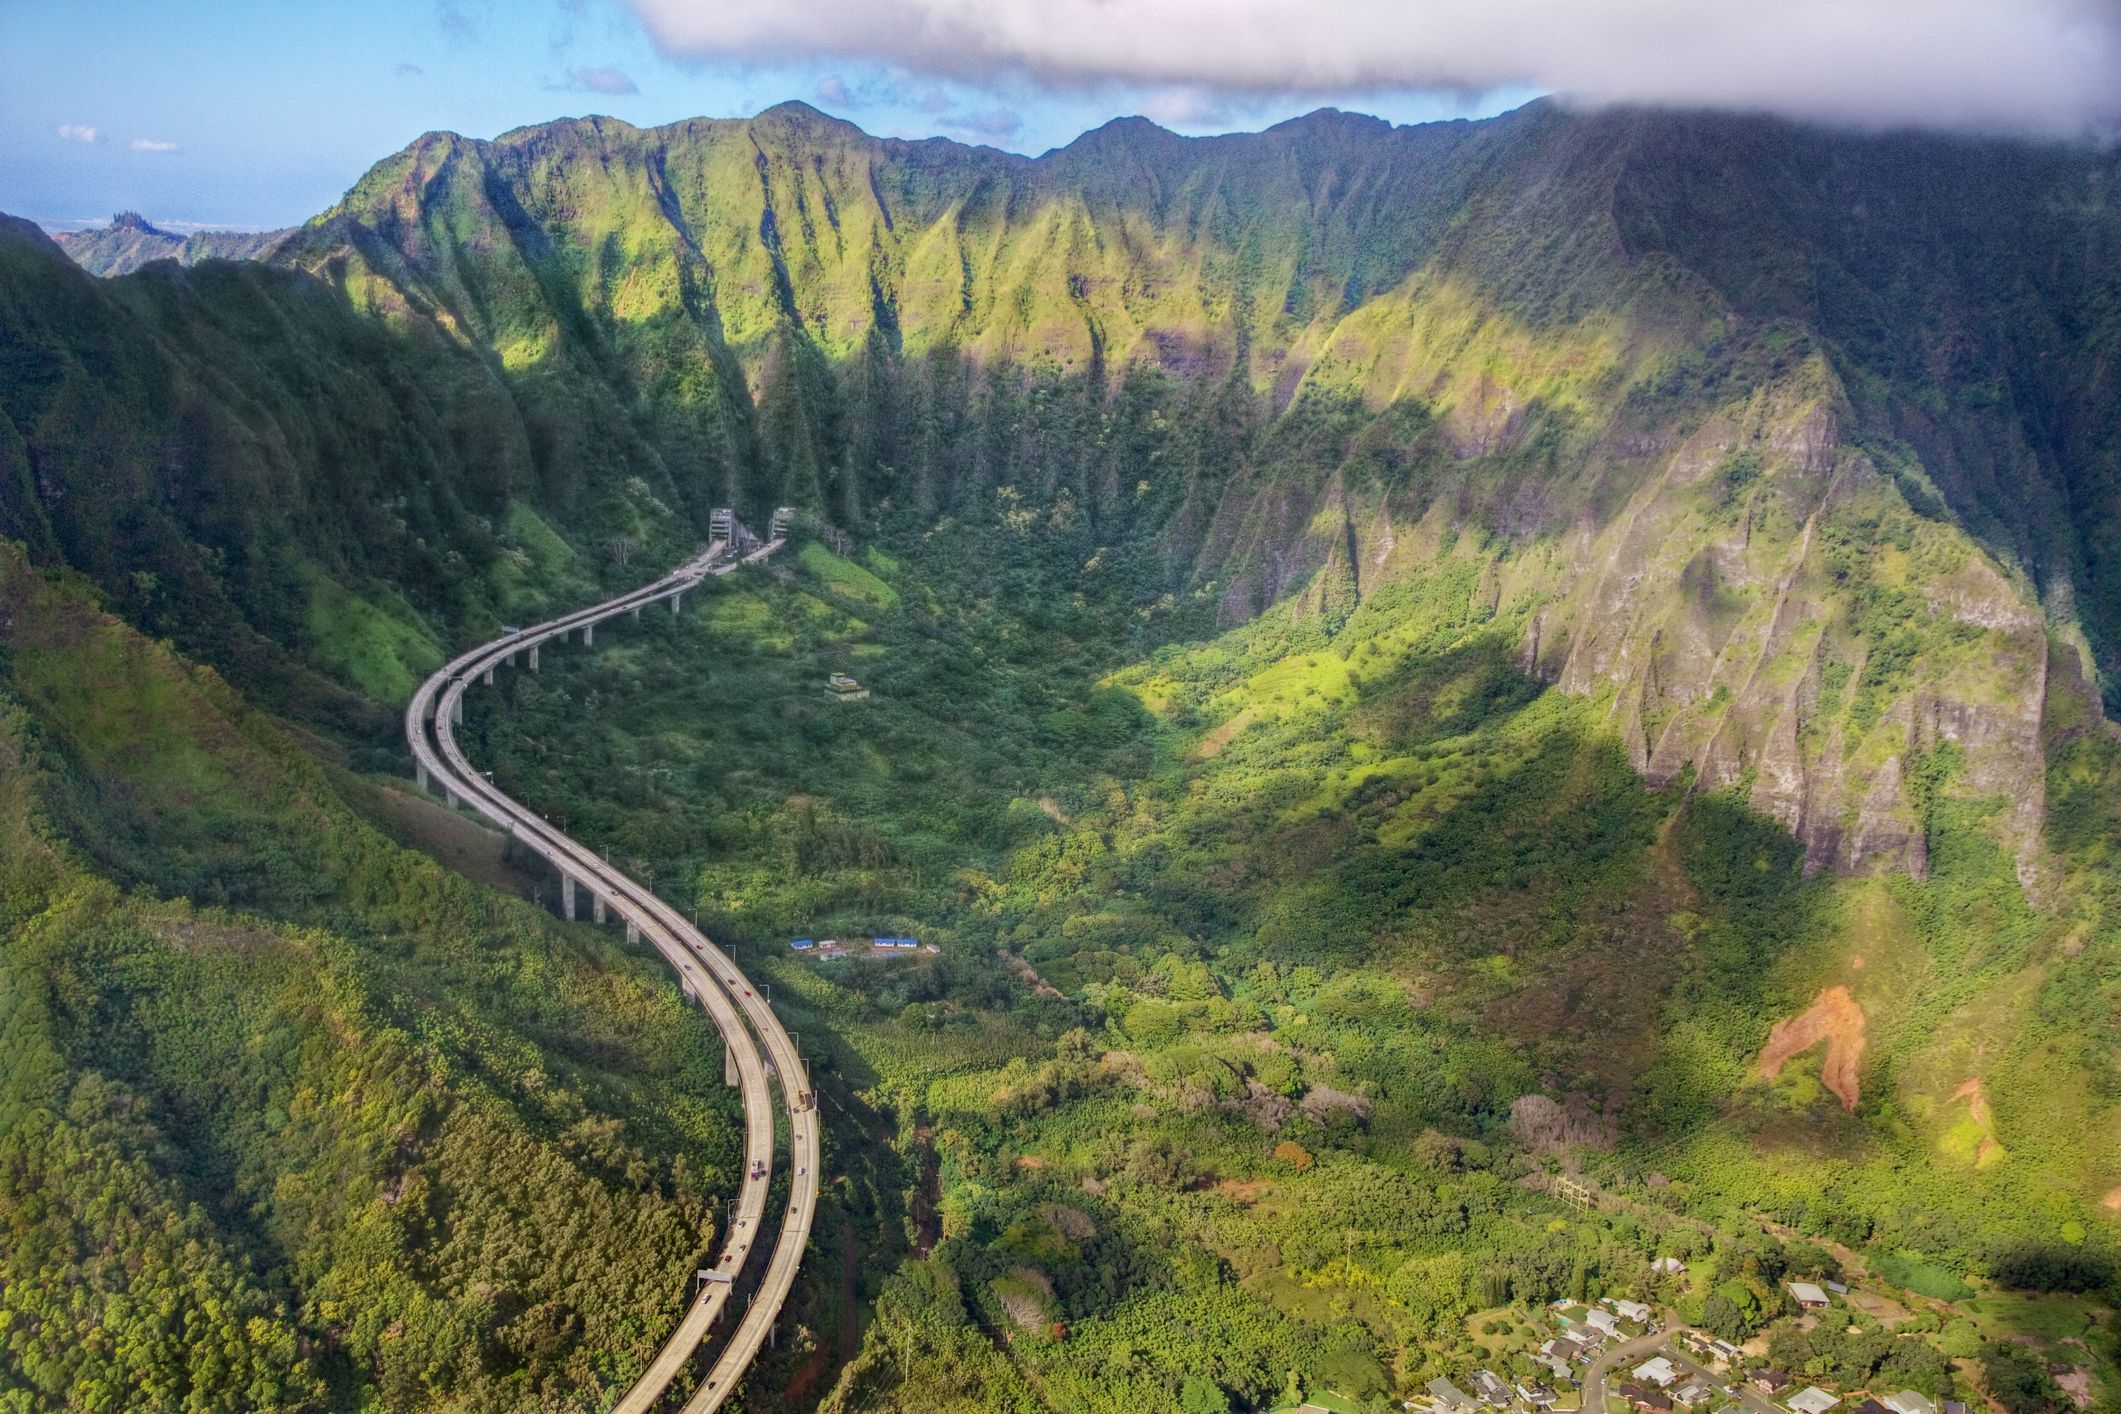 Hawaii Day Trip To Big Island